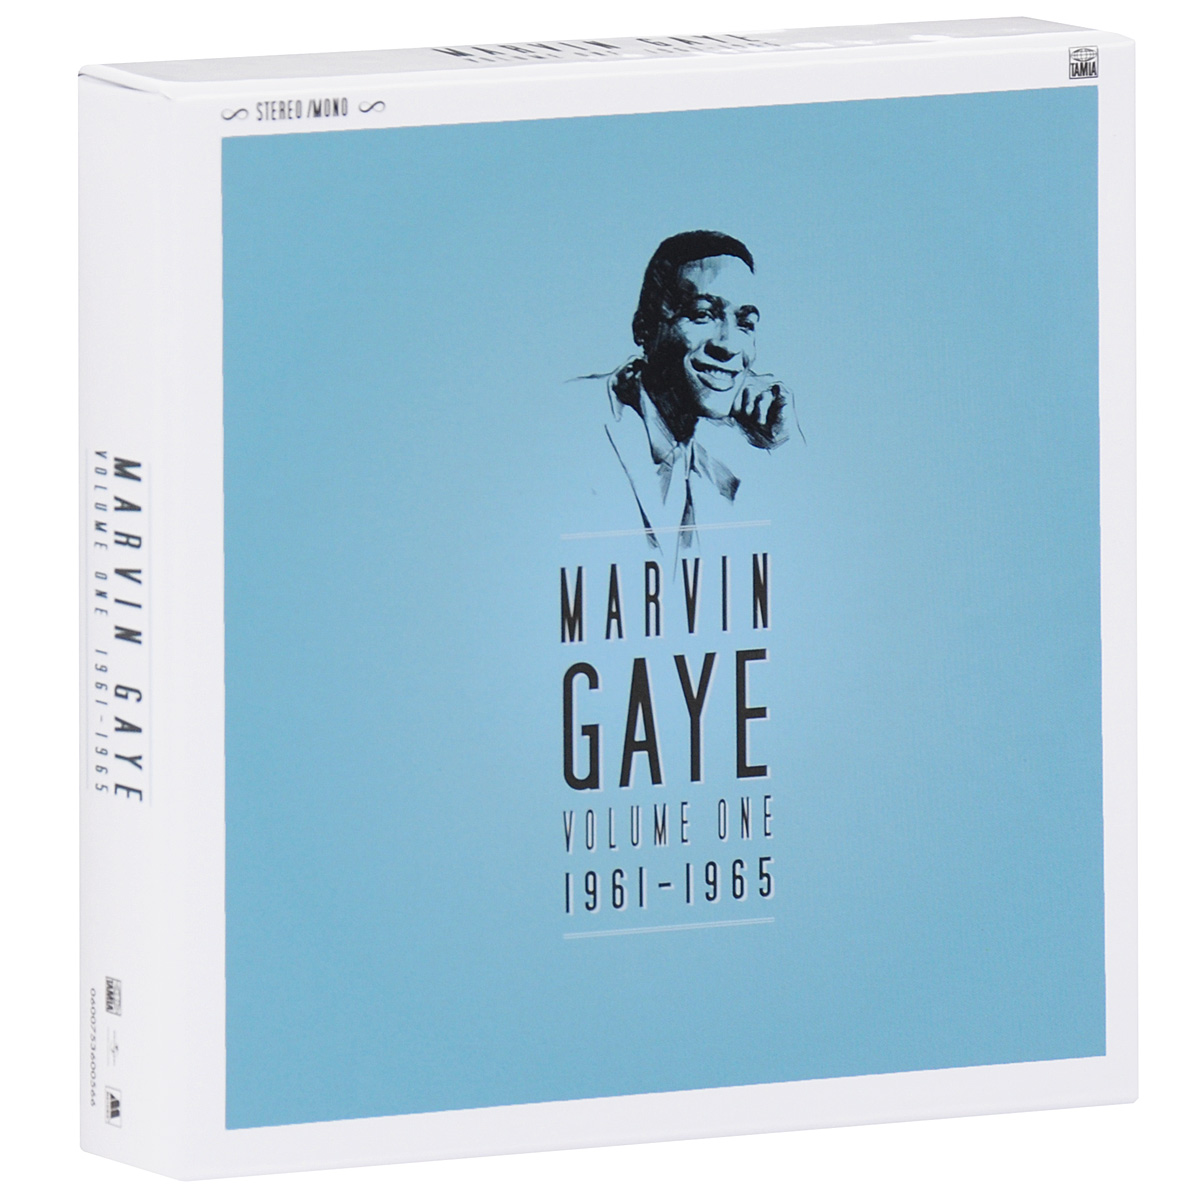 Марвин Гэй Marvin Gaye. Volume One. 1961 - 1965 (7 CD) marvin gaye marvin gaye here my dear 2 lp